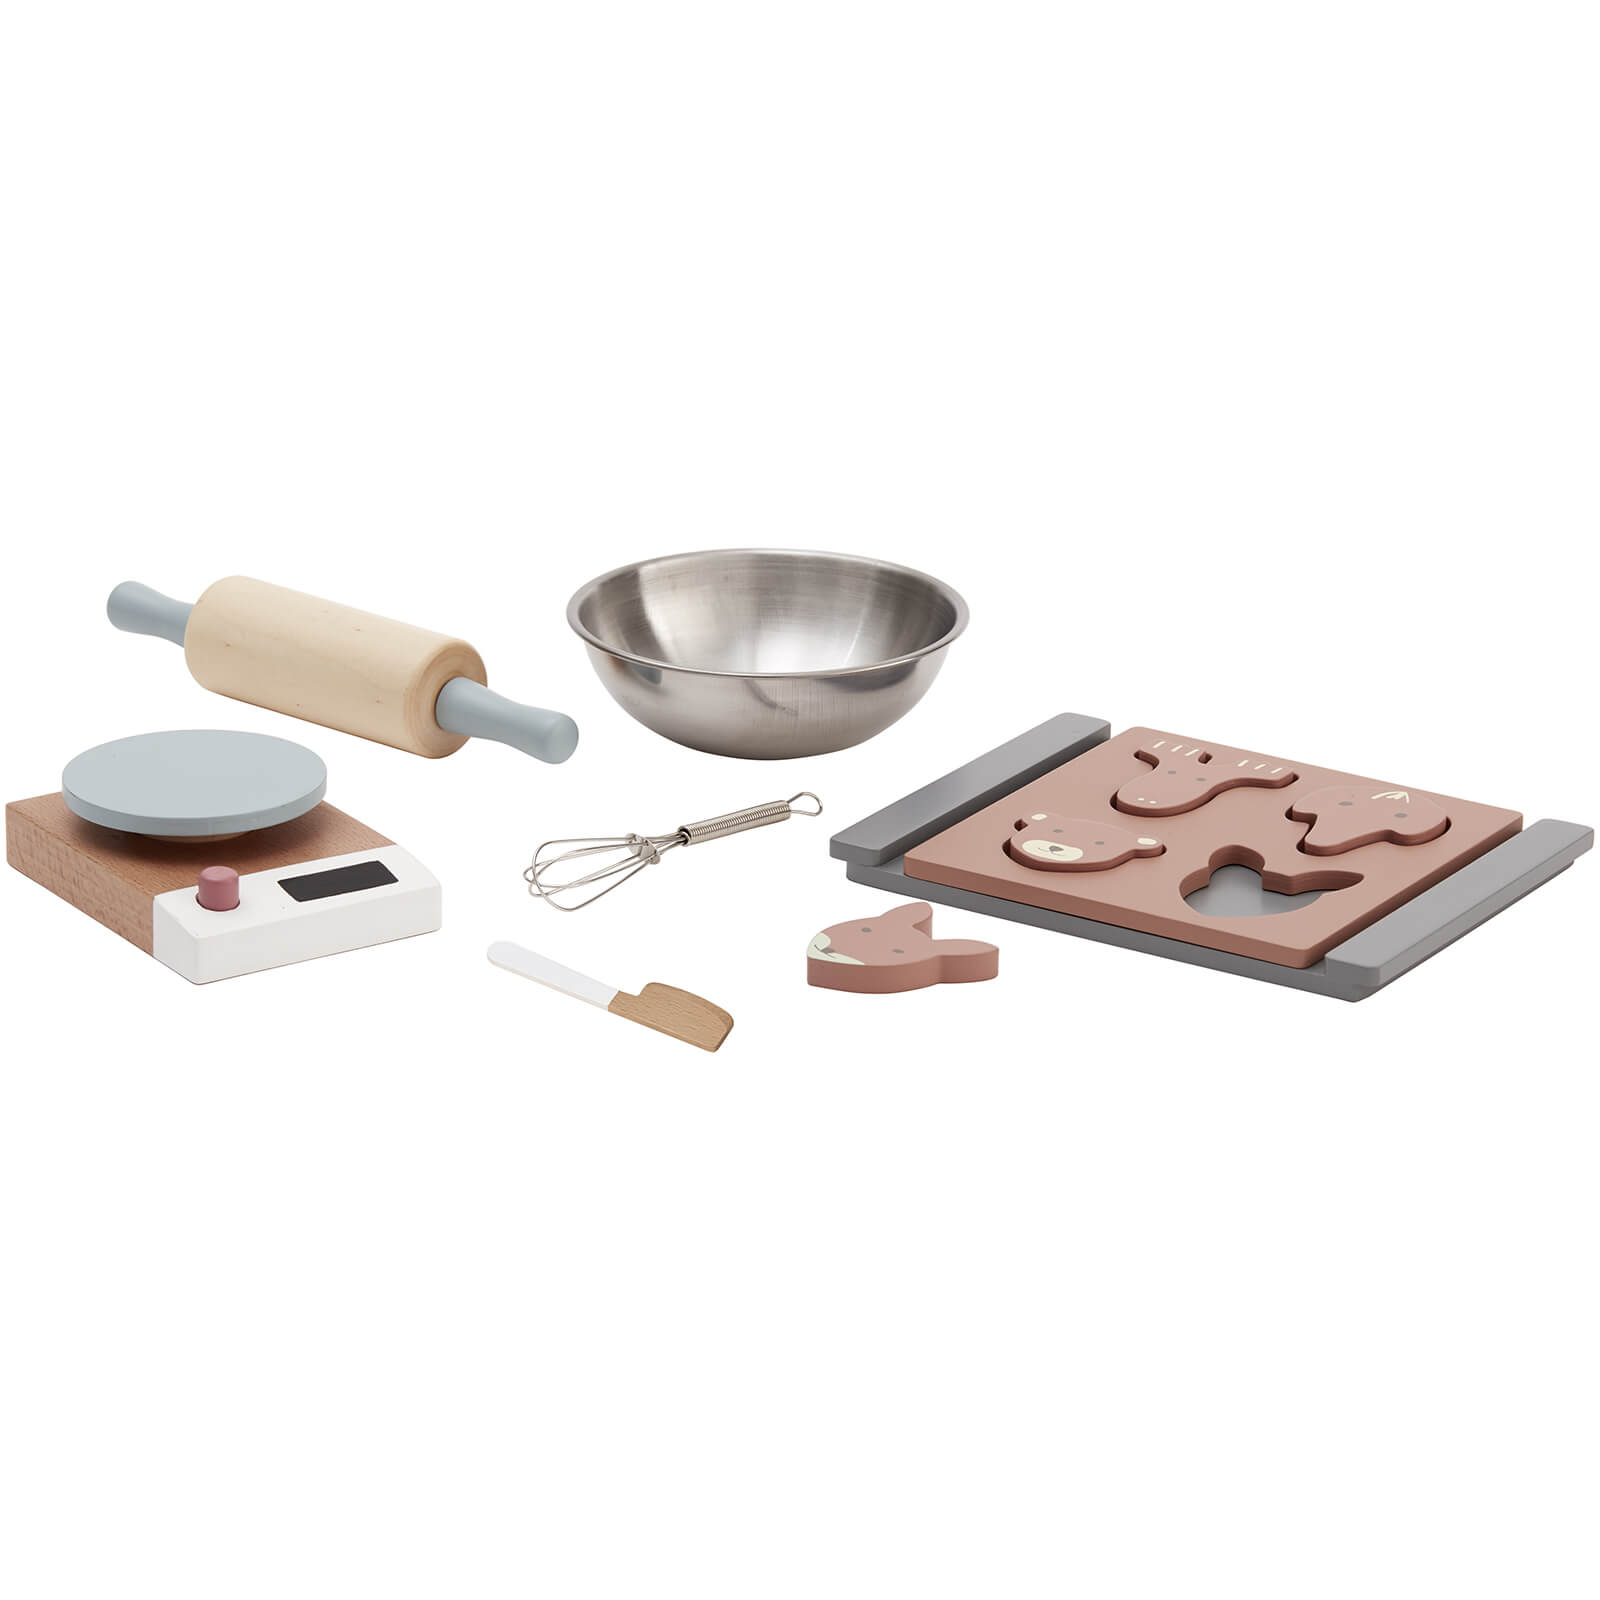 Kids Concept Baking Set